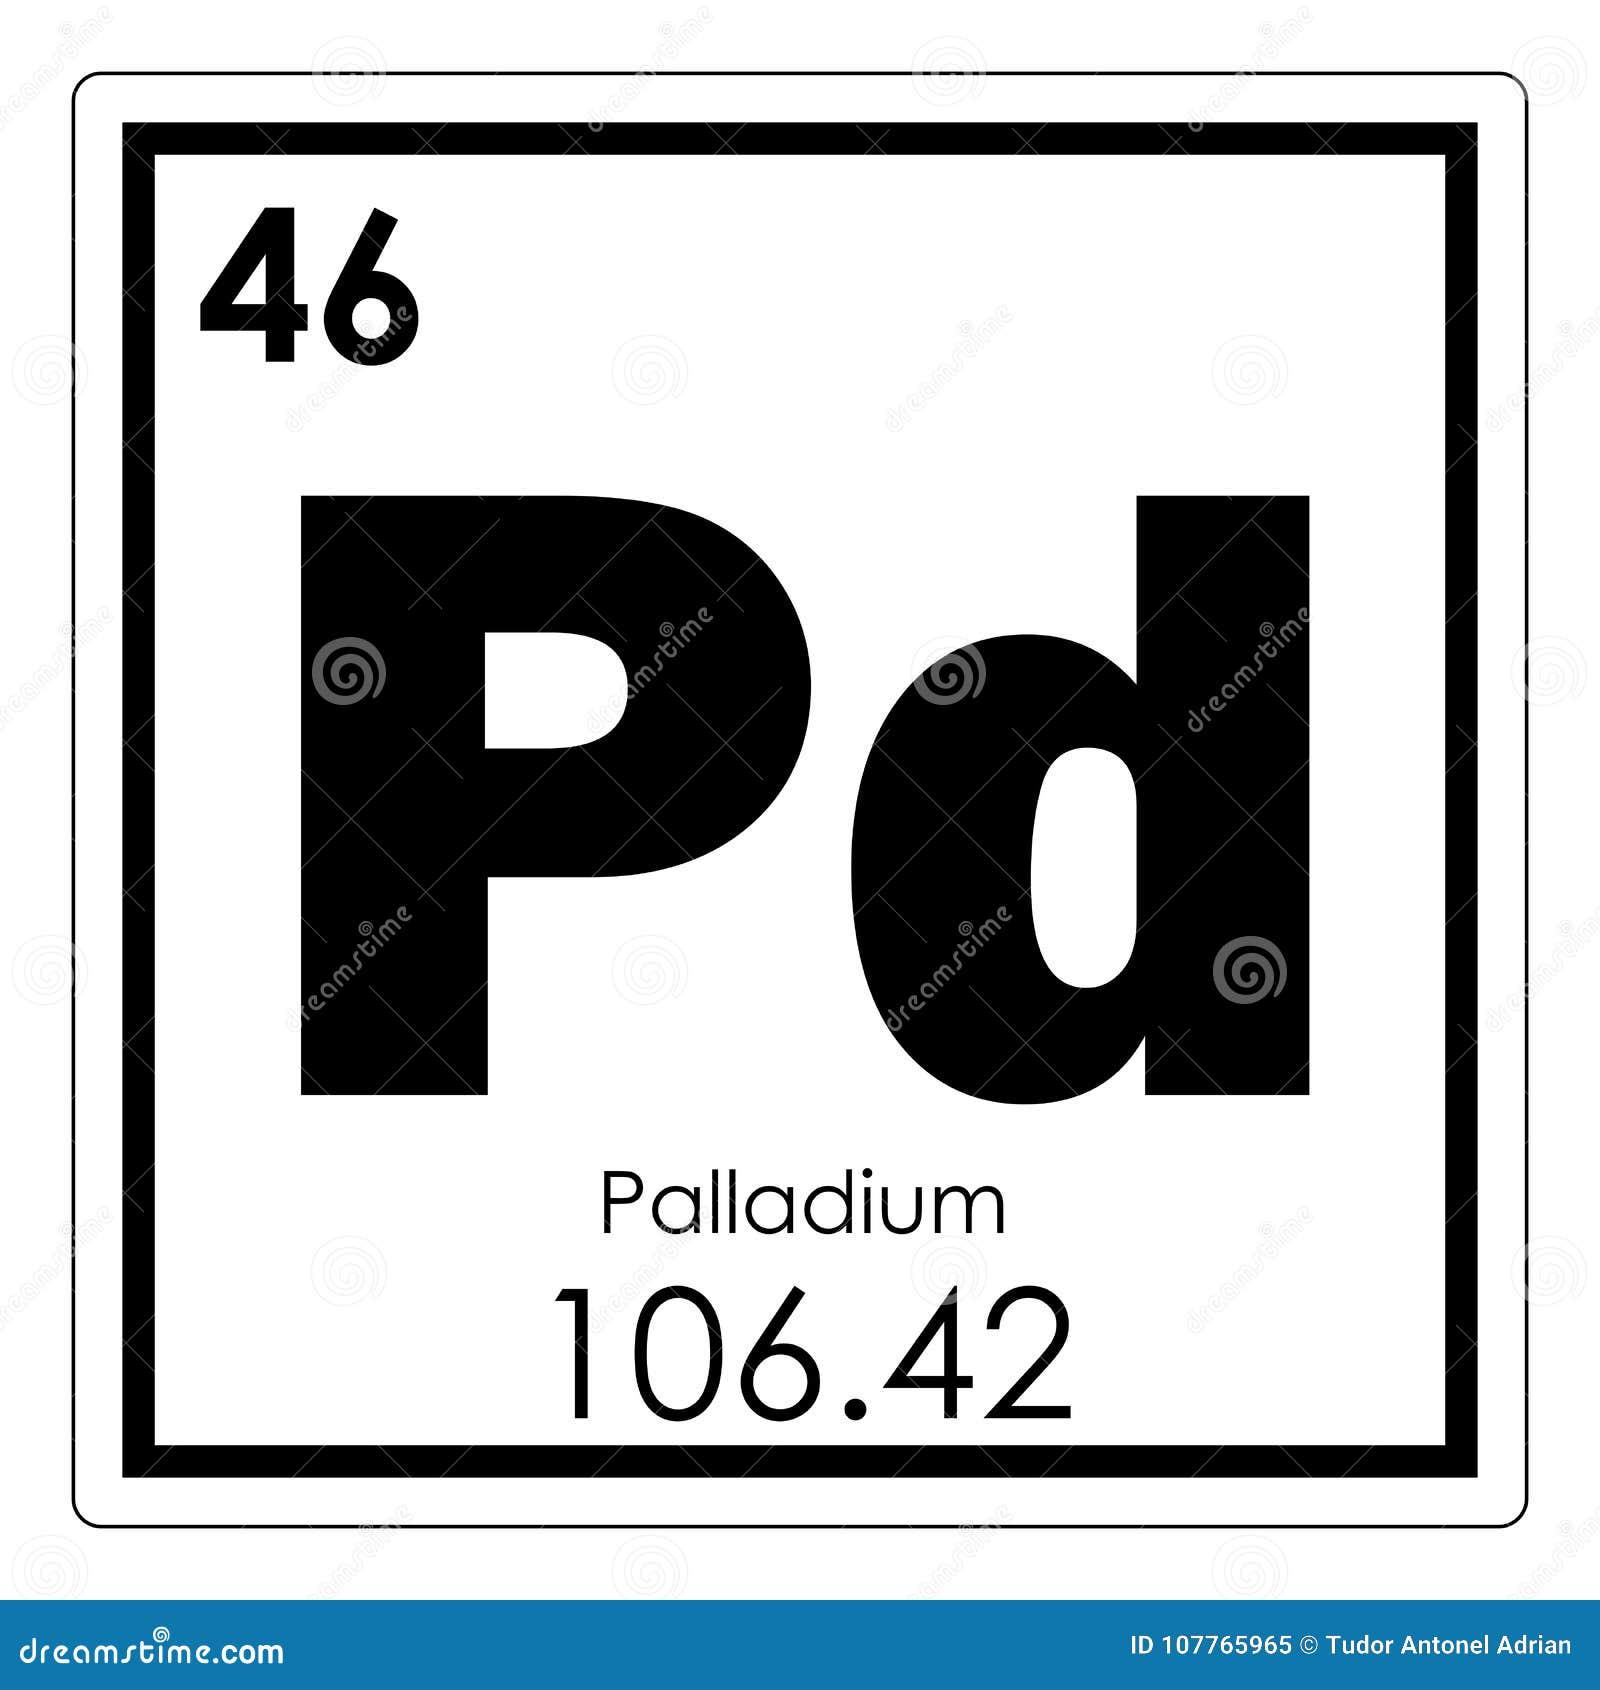 Palladium Chemical Element Stock Illustration Illustration Of